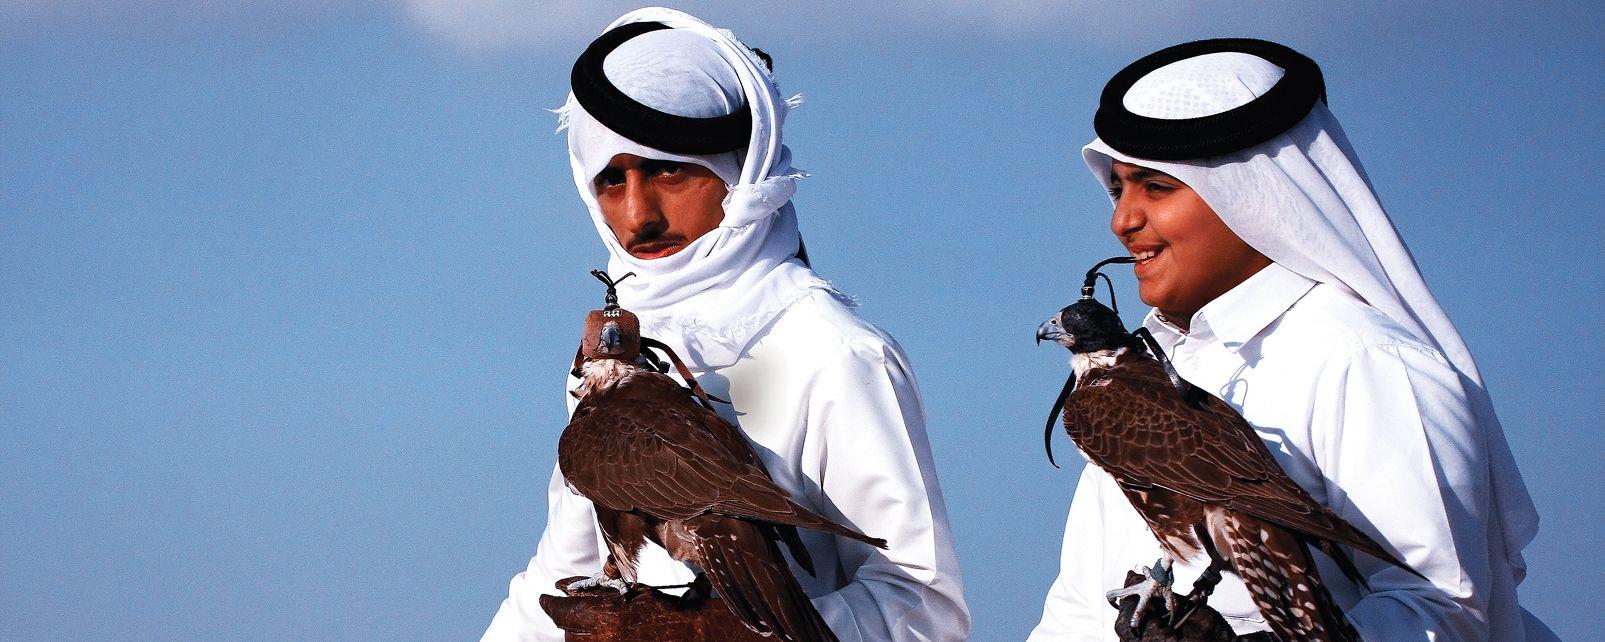 Les tenues traditionnelles qataries , Qatar